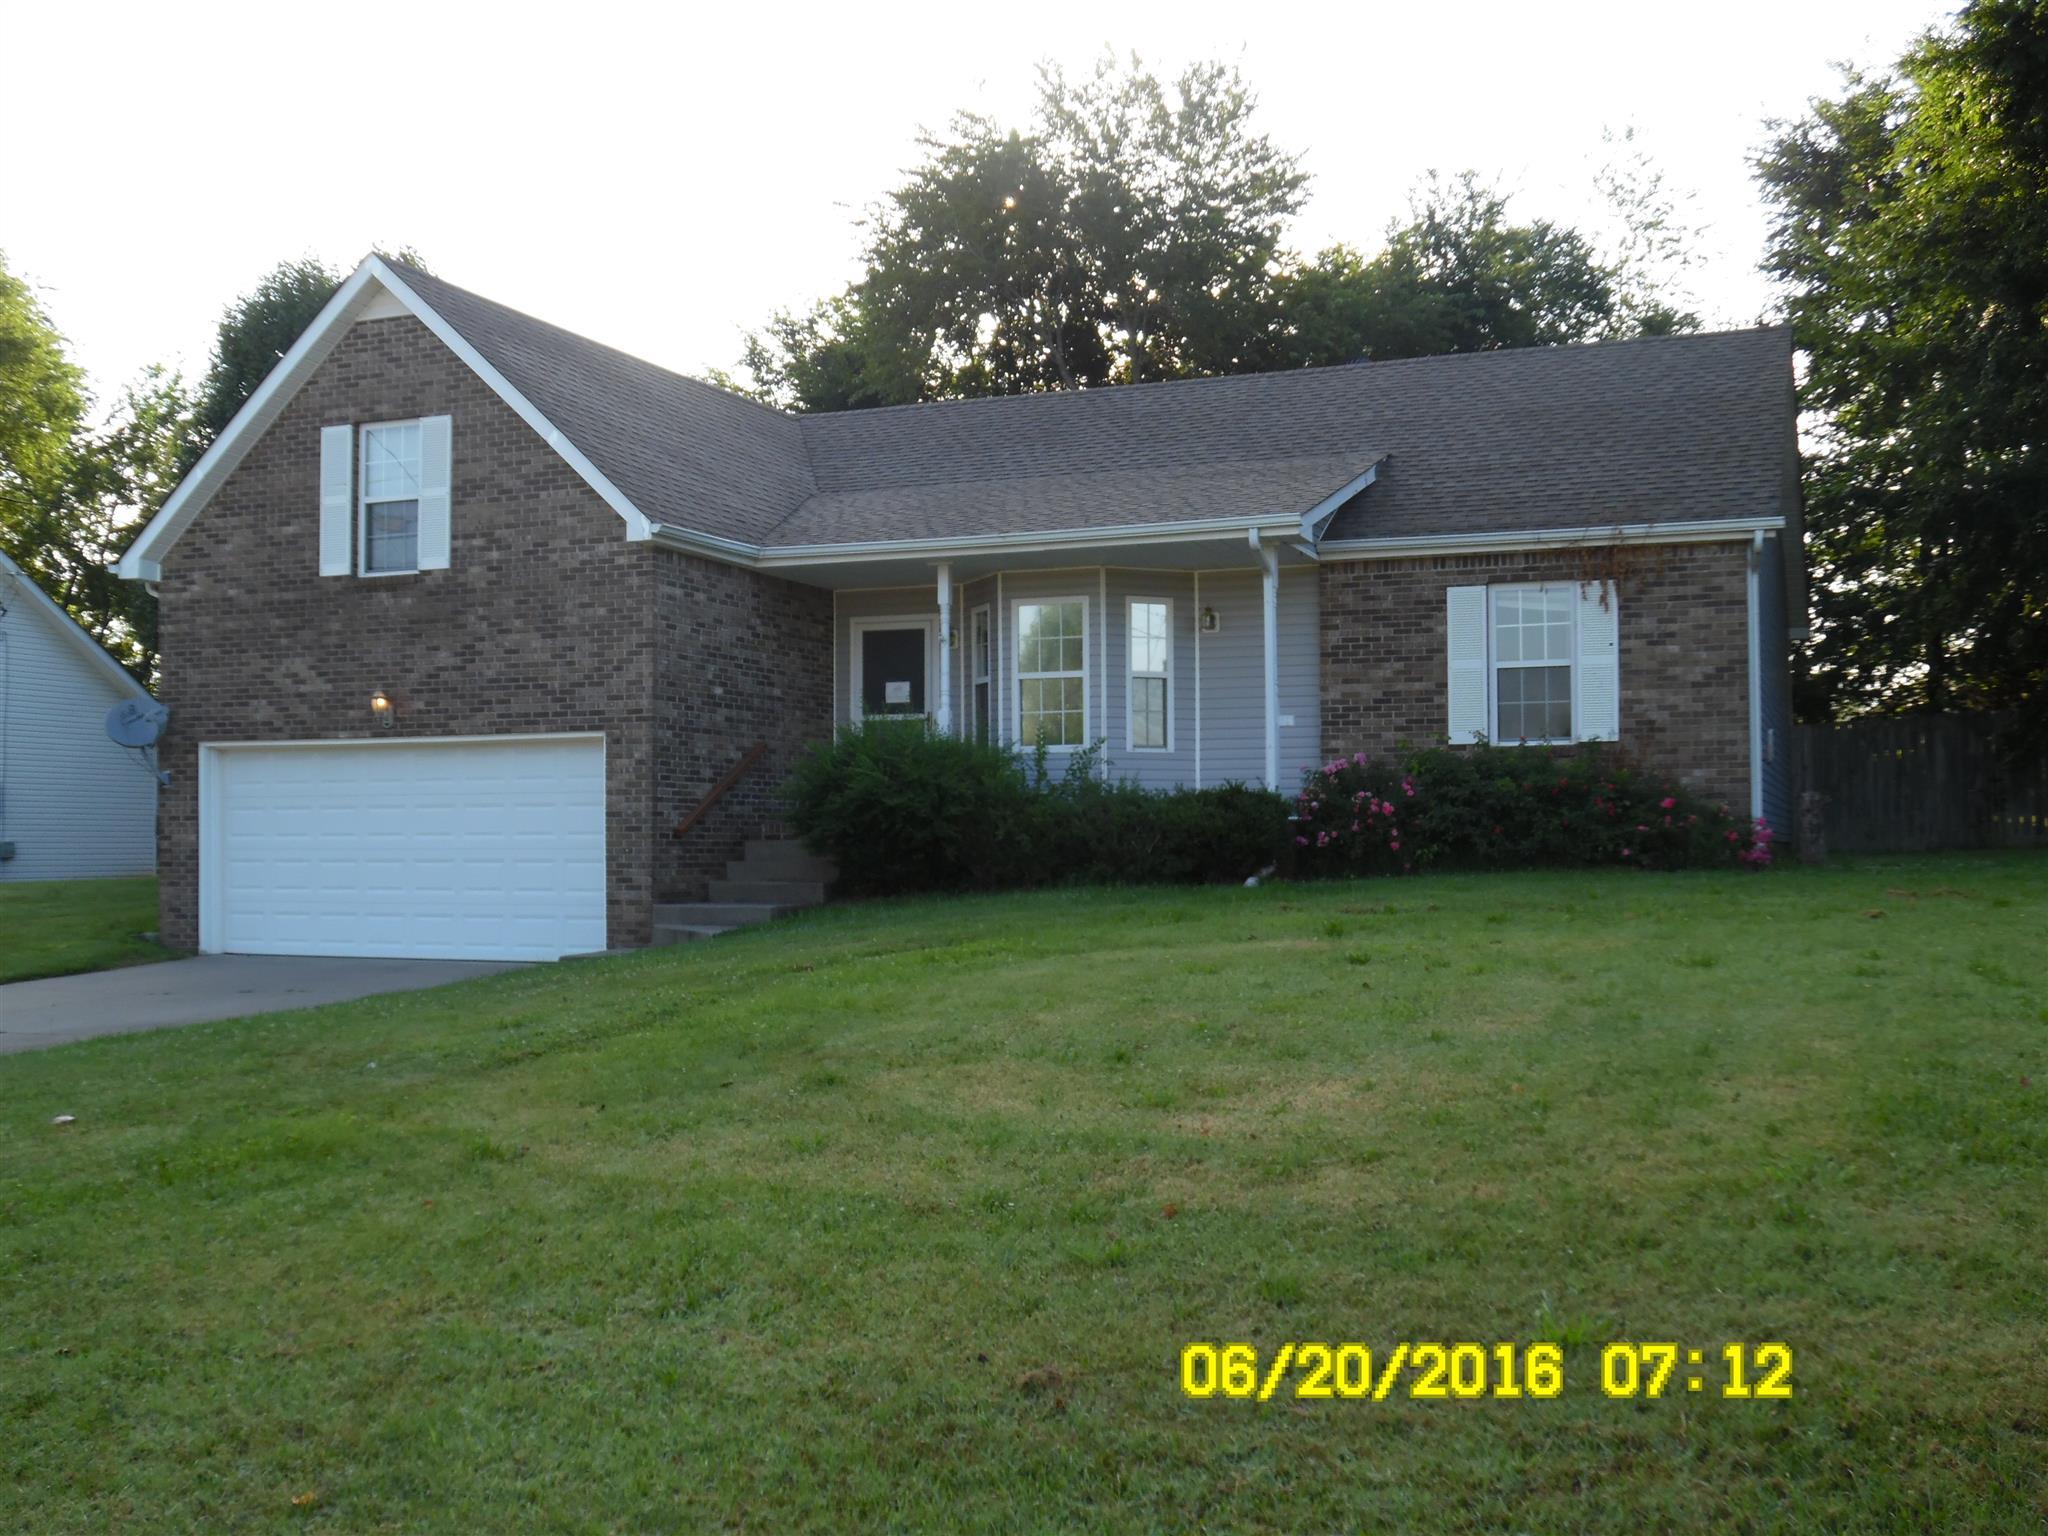 1349 Ambleside Dr, Clarksville, TN 37040